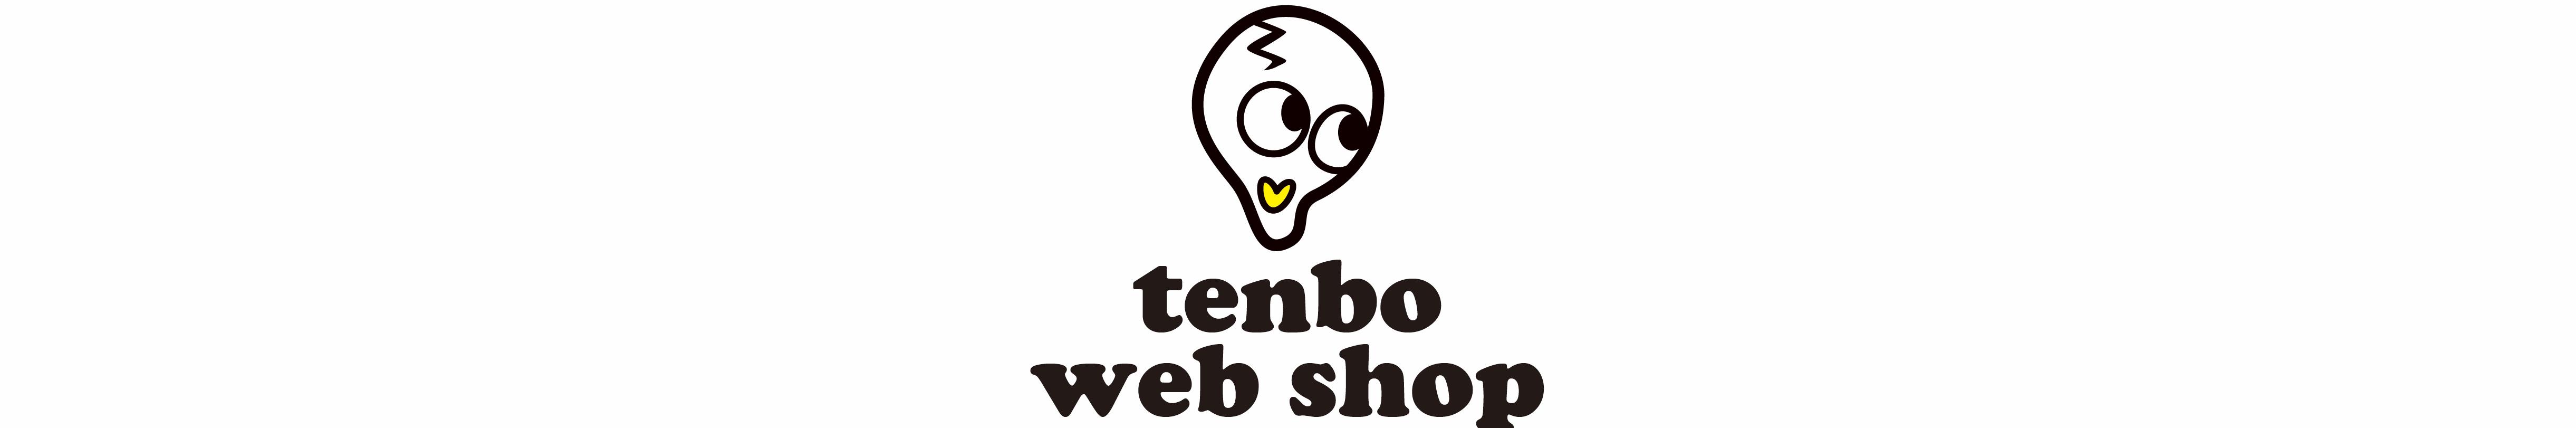 tenbo webshop